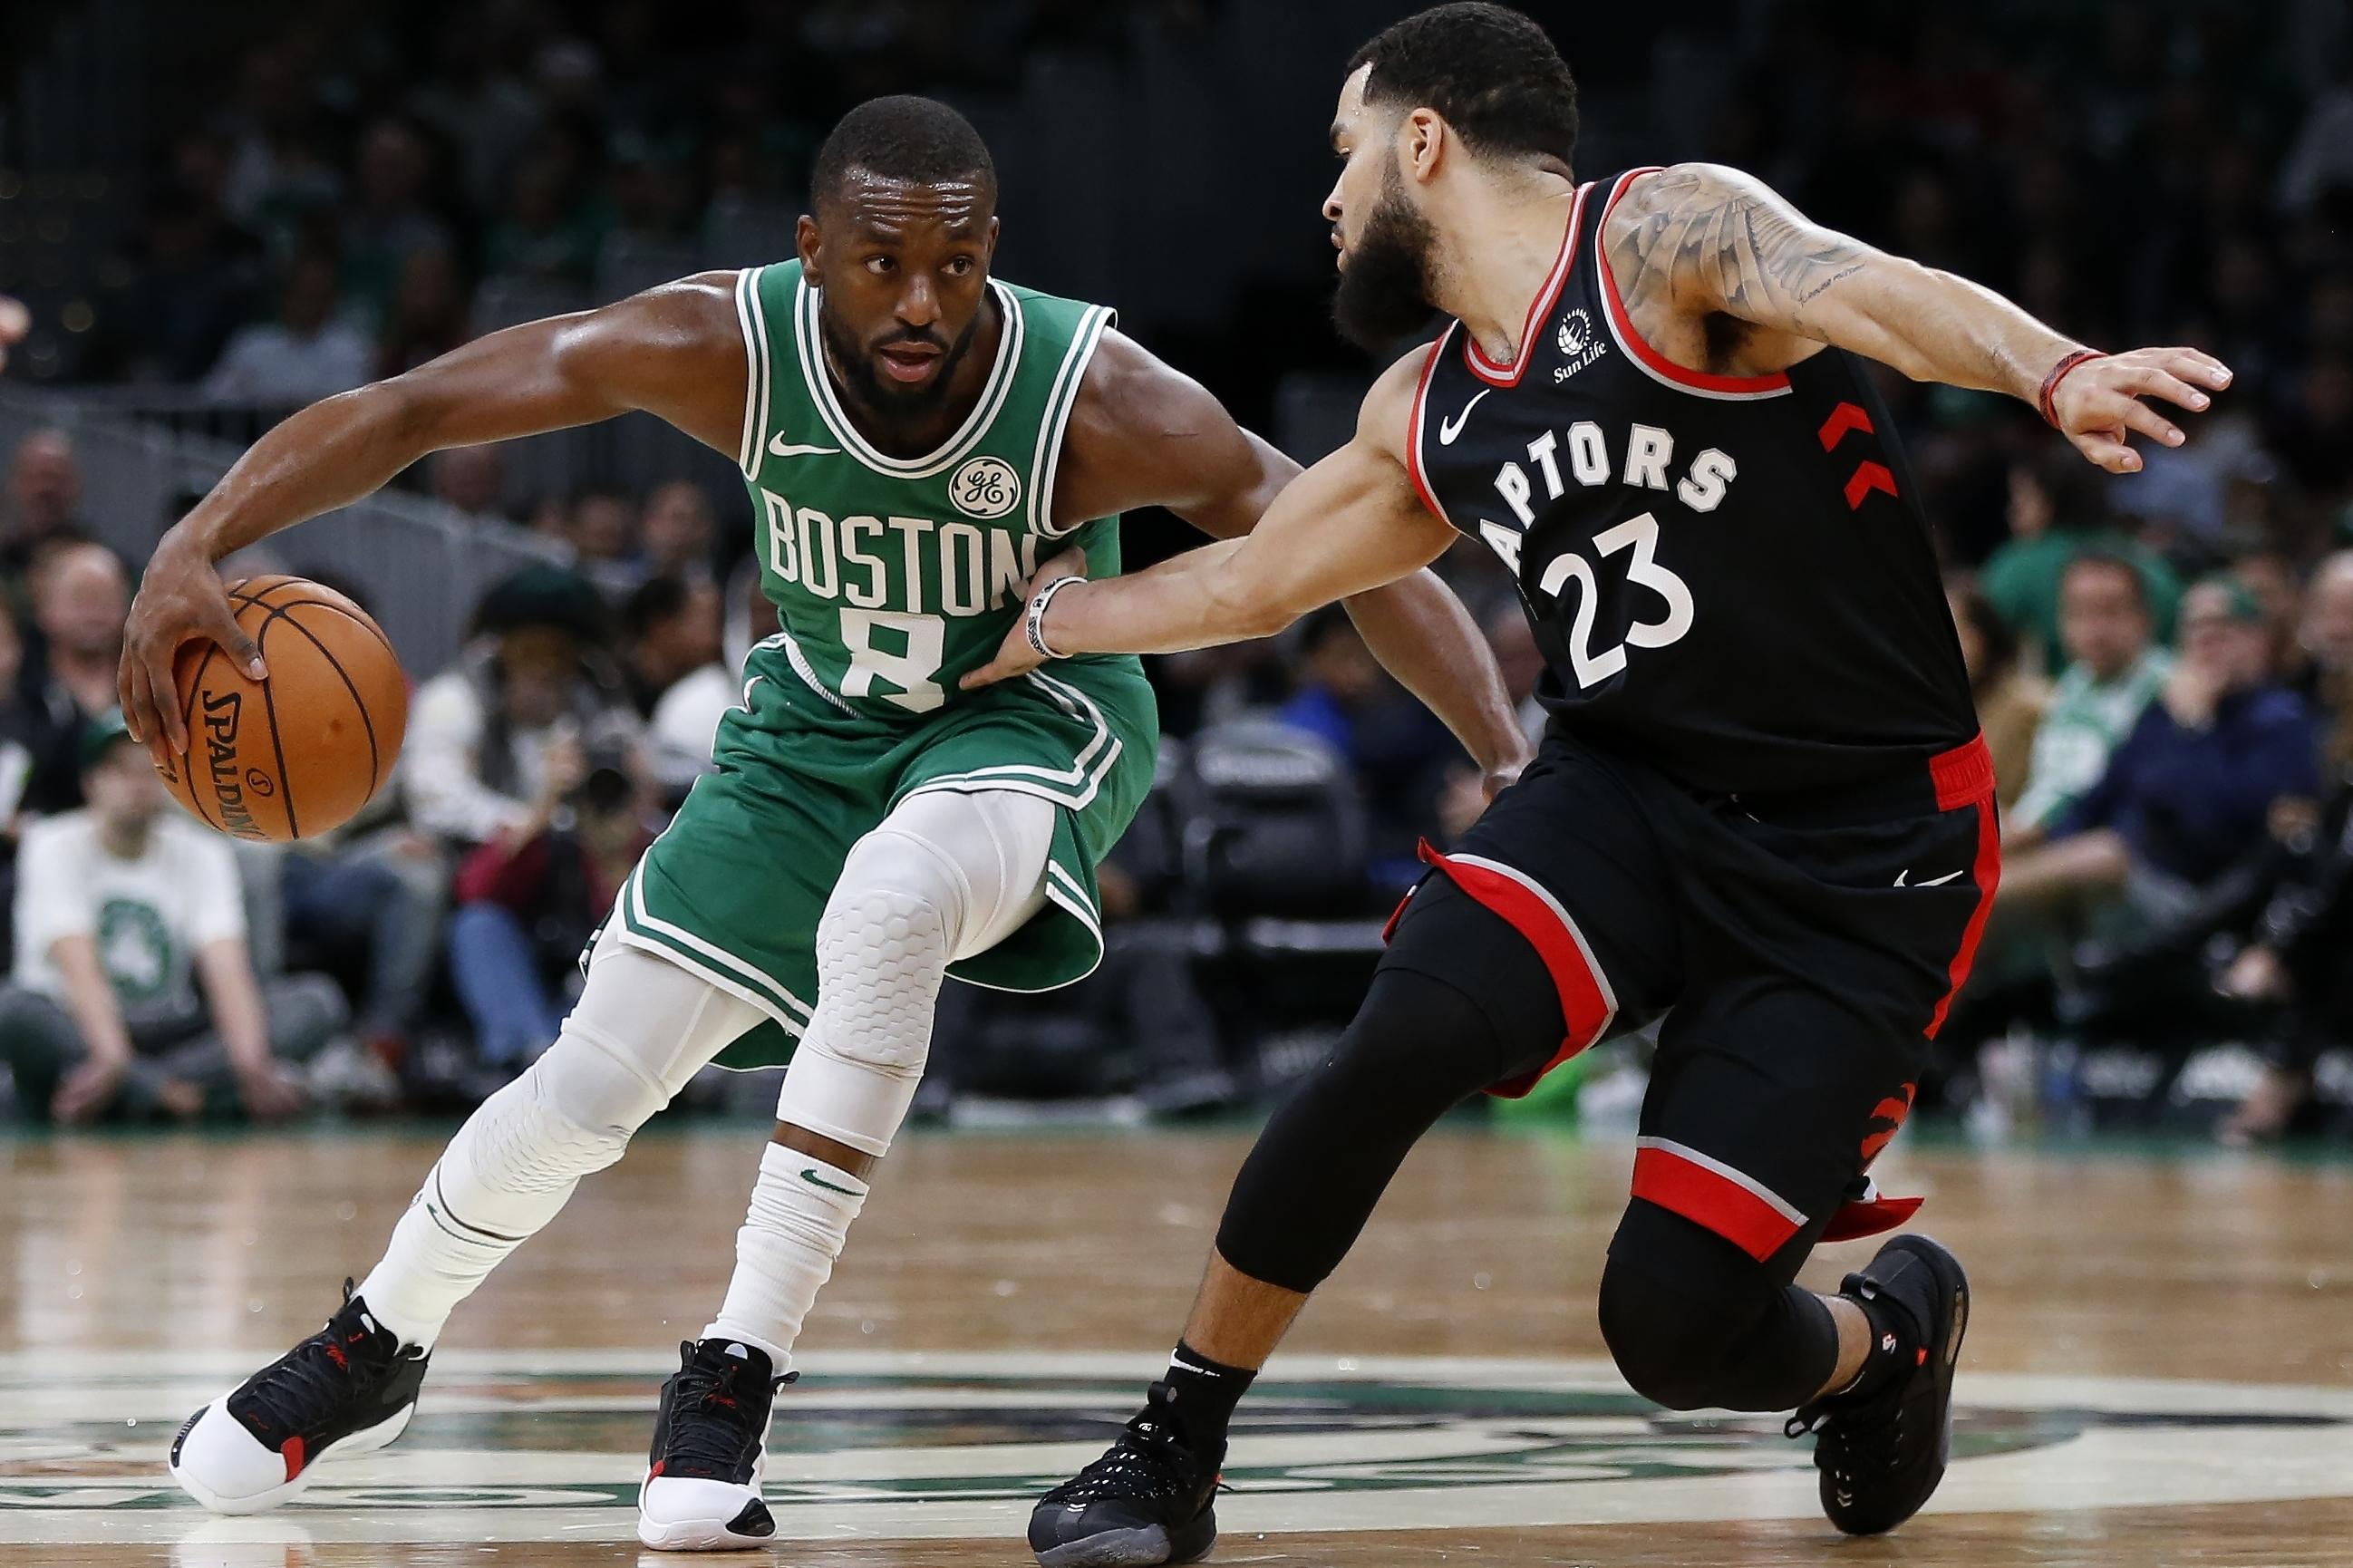 Brown scores 25, Celtics rally late to beat Raptors 112-106